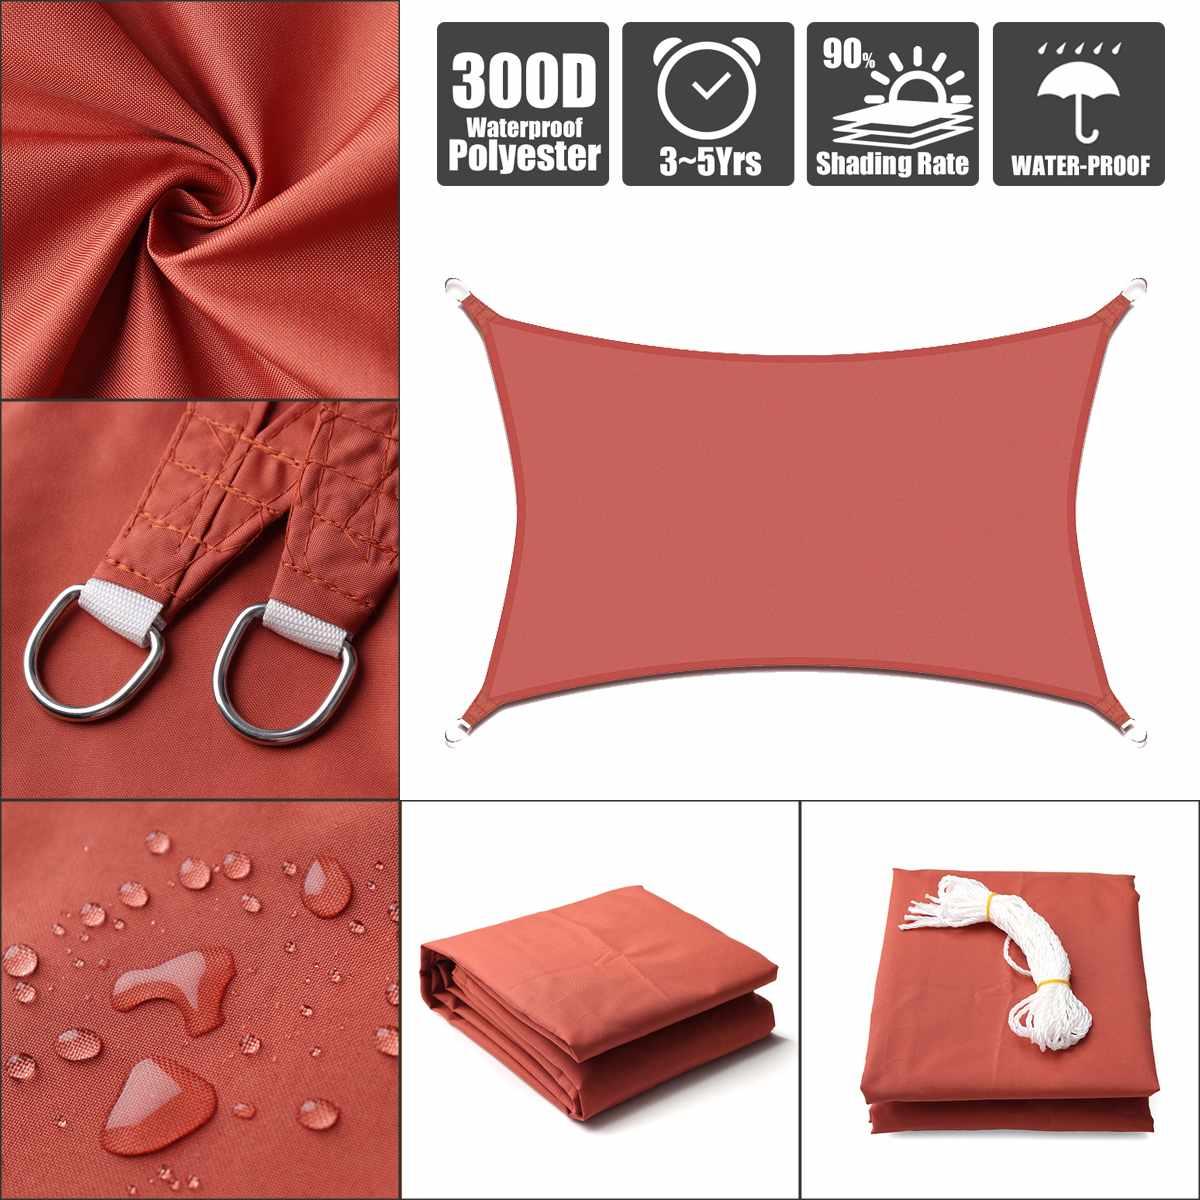 2.5x2.5 3x3 4x4 2x3 2x4 Rust Red Rectangle Square 300D 160GSM Polyester Oxford Fabric Shade Sail Sun2.5x2.5 3x3 4x4 2x3 2x4 Rust Red Rectangle Square 300D 160GSM Polyester Oxford Fabric Shade Sail Sun